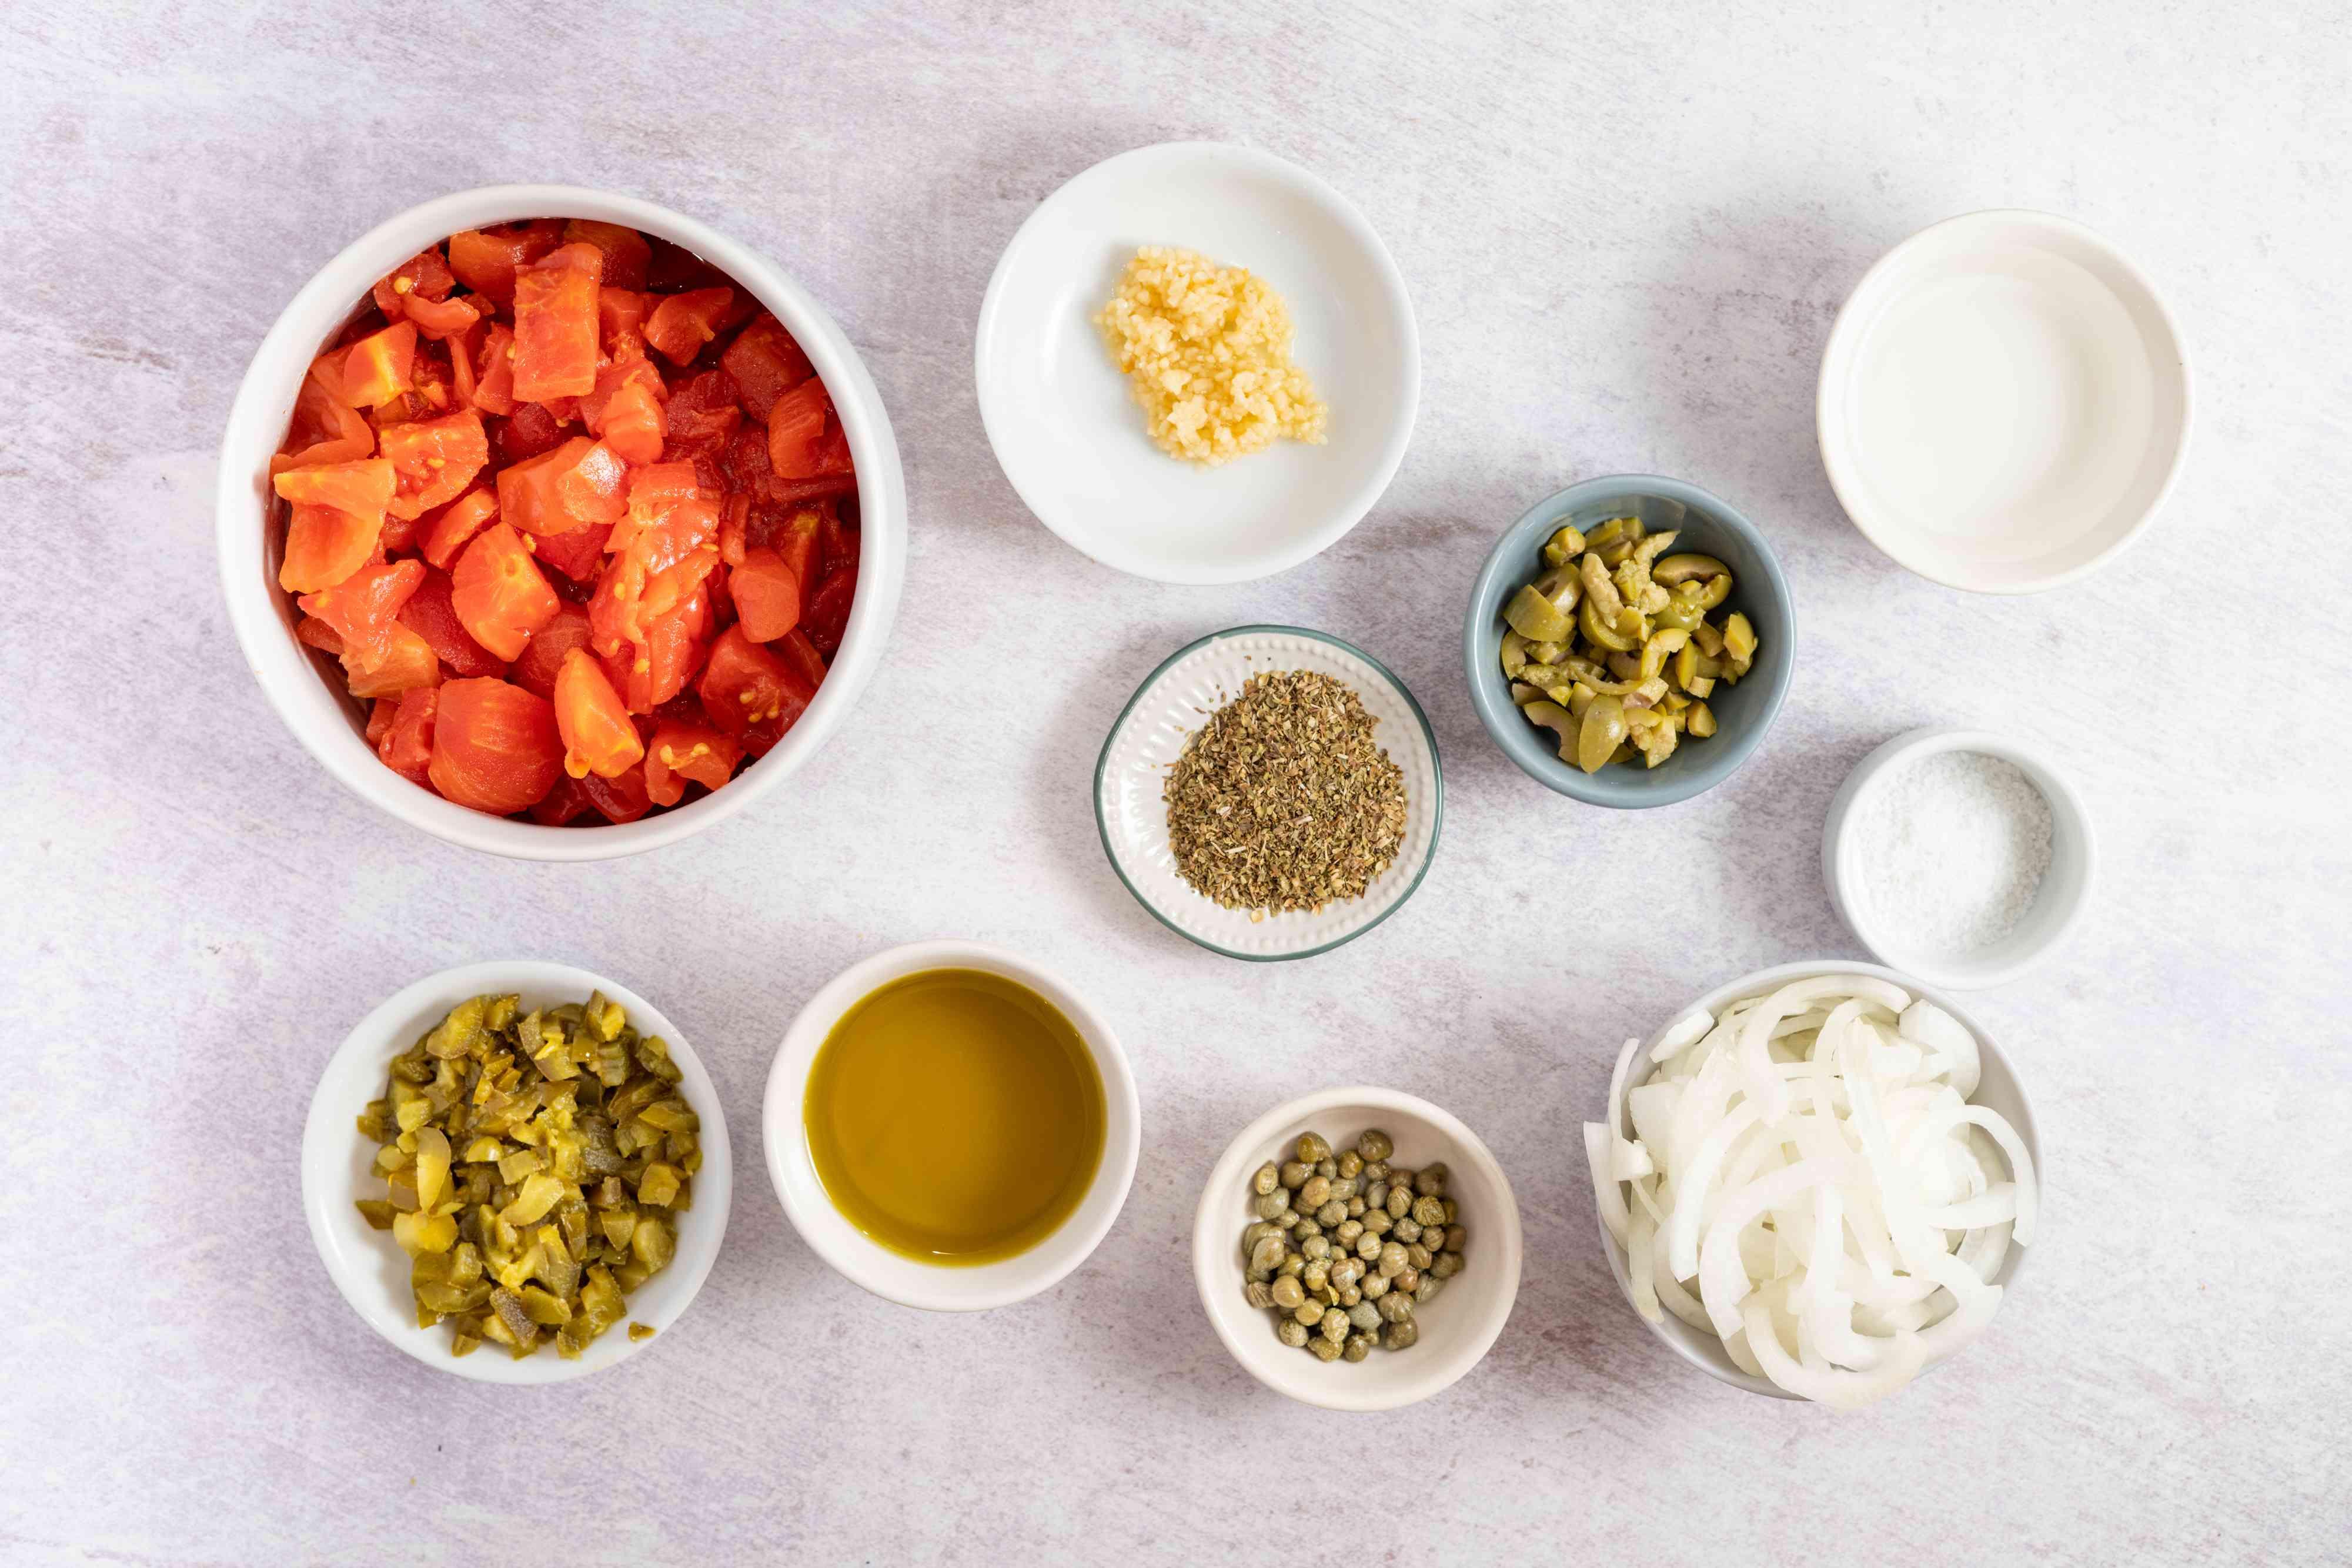 Veracruz Sauce (for Fish or Chicken) ingredients